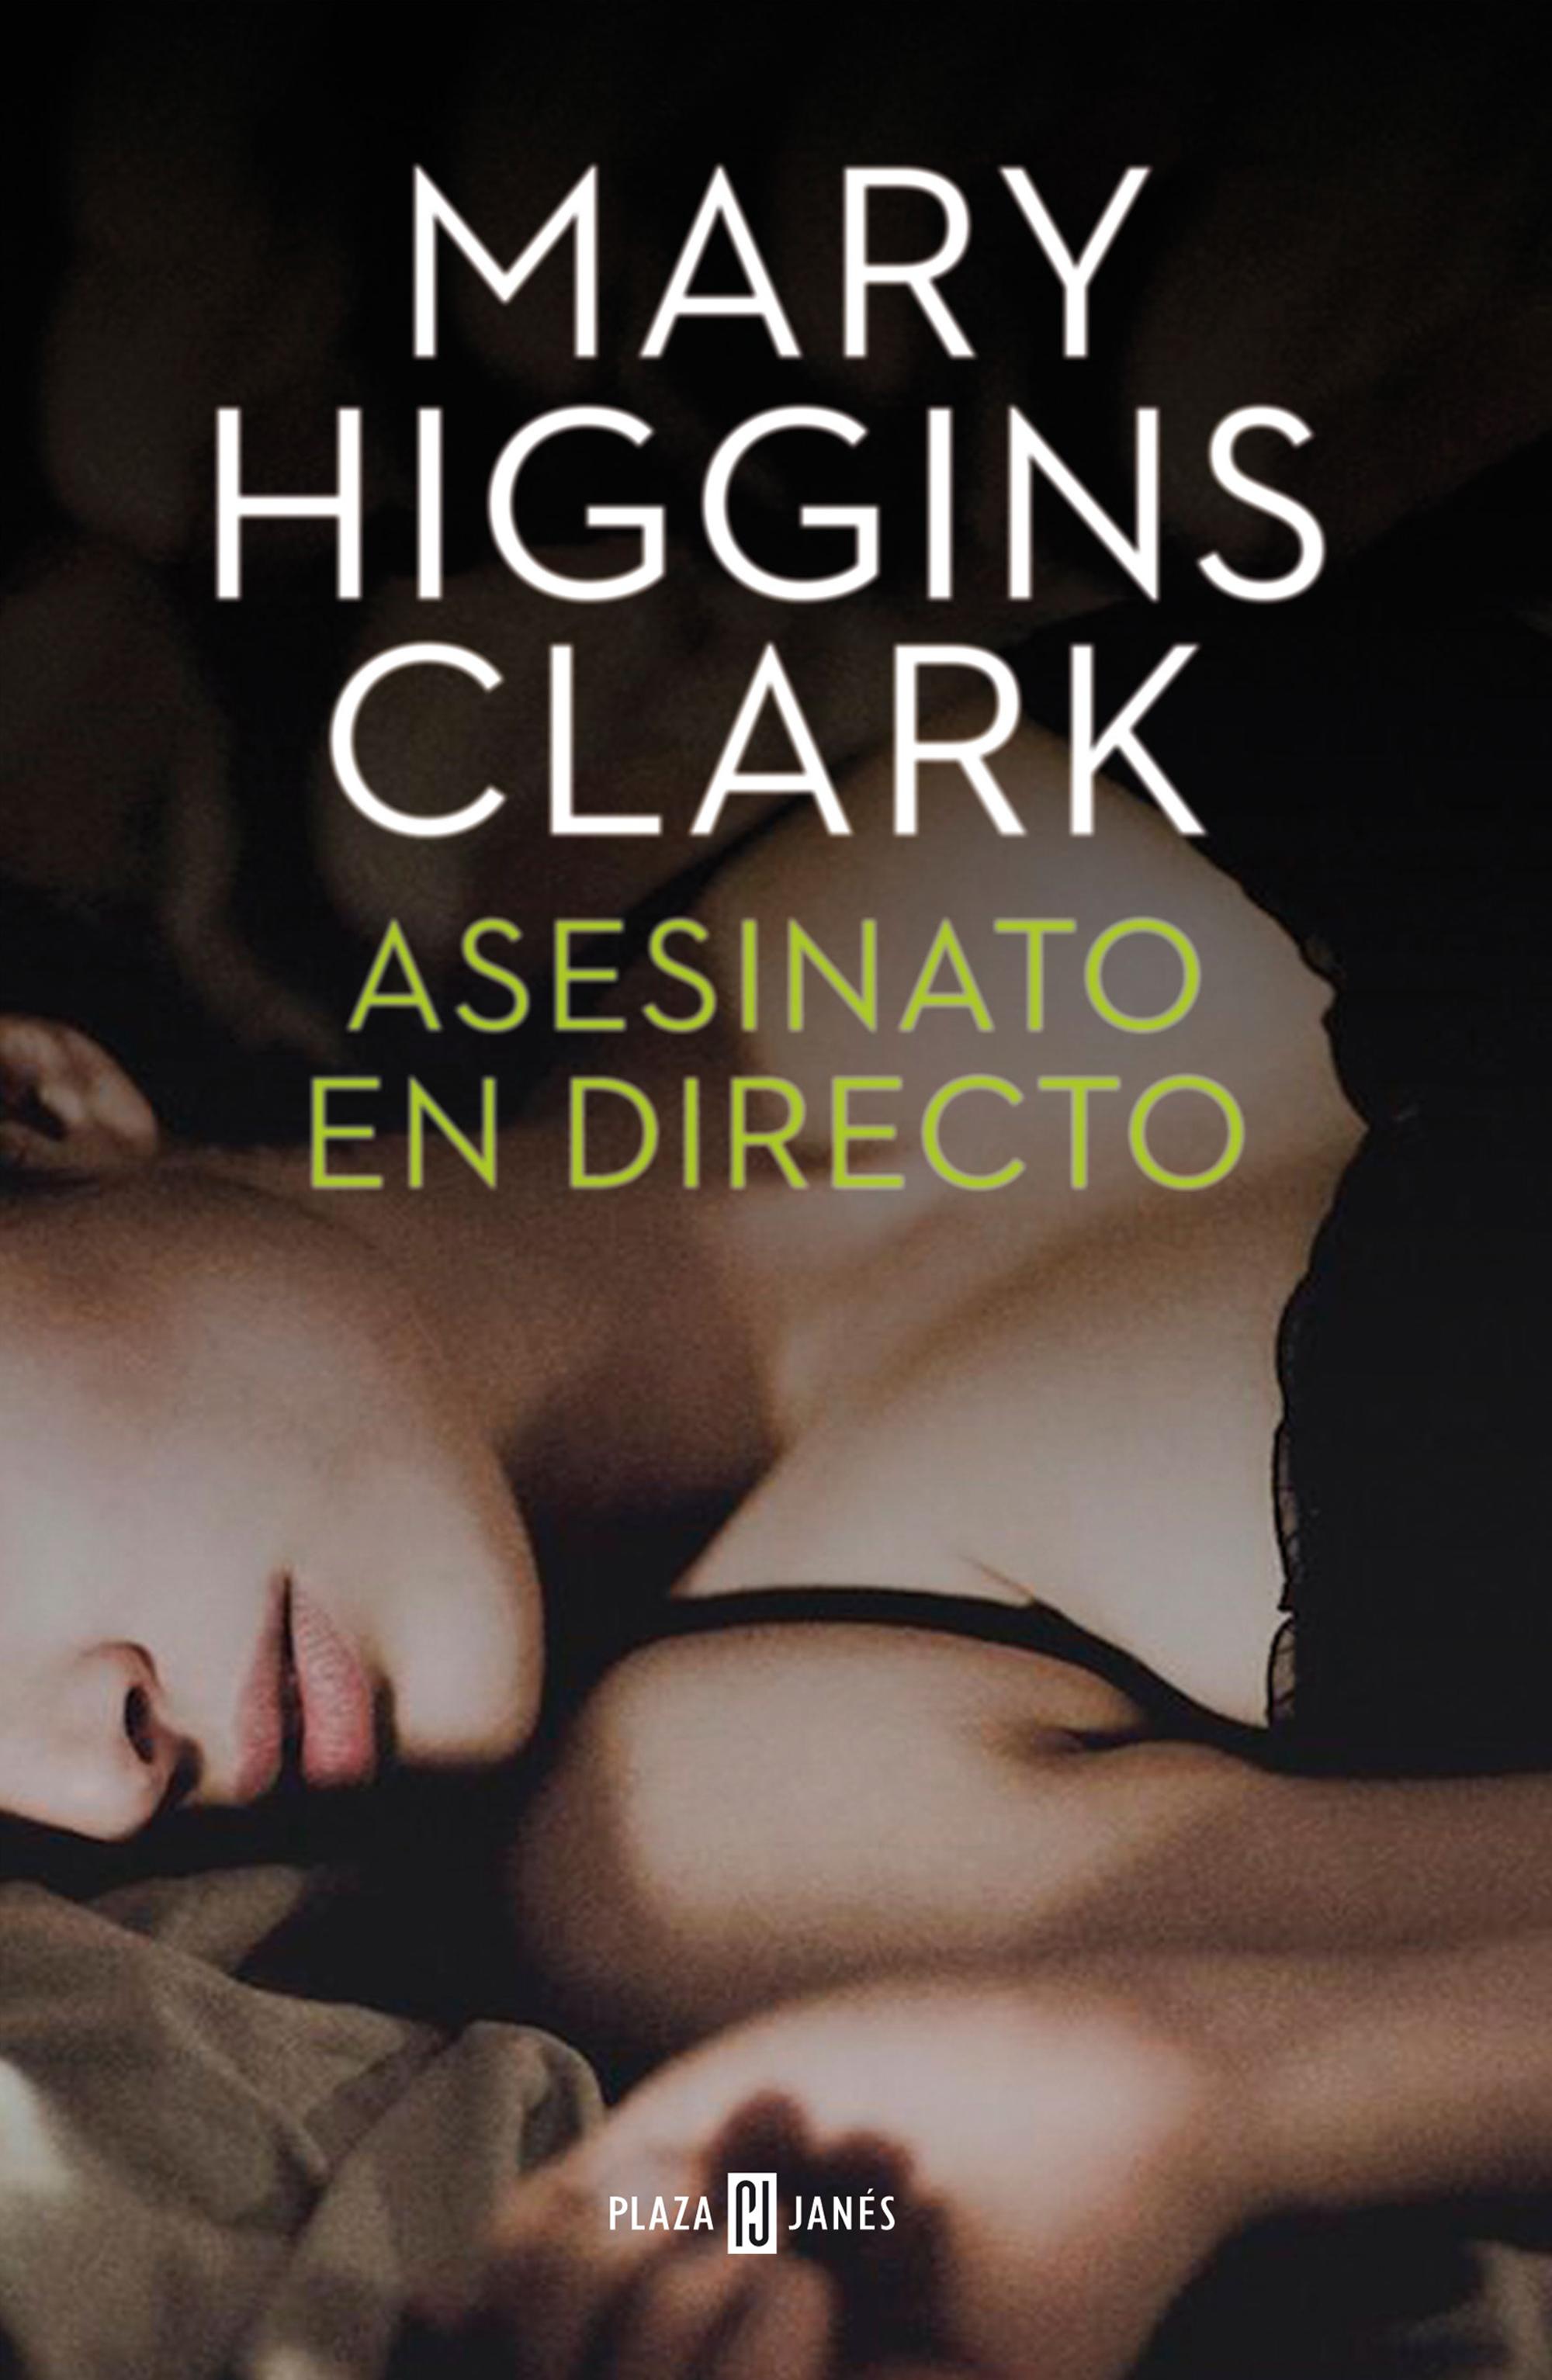 Asesinato en dreicto - Mary Higgins Clark Portada